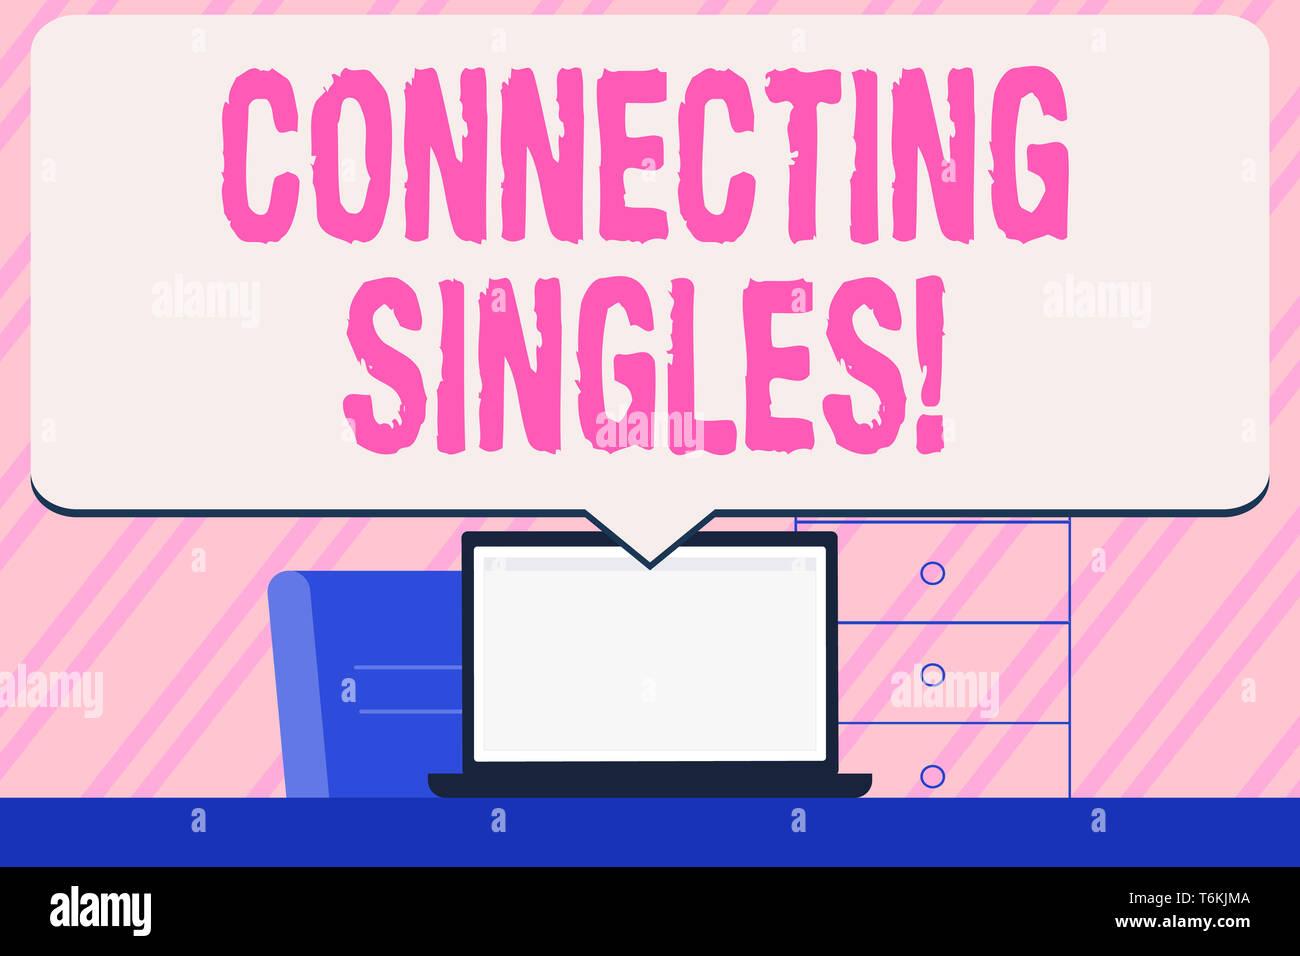 Dating White singles ku matchmaking